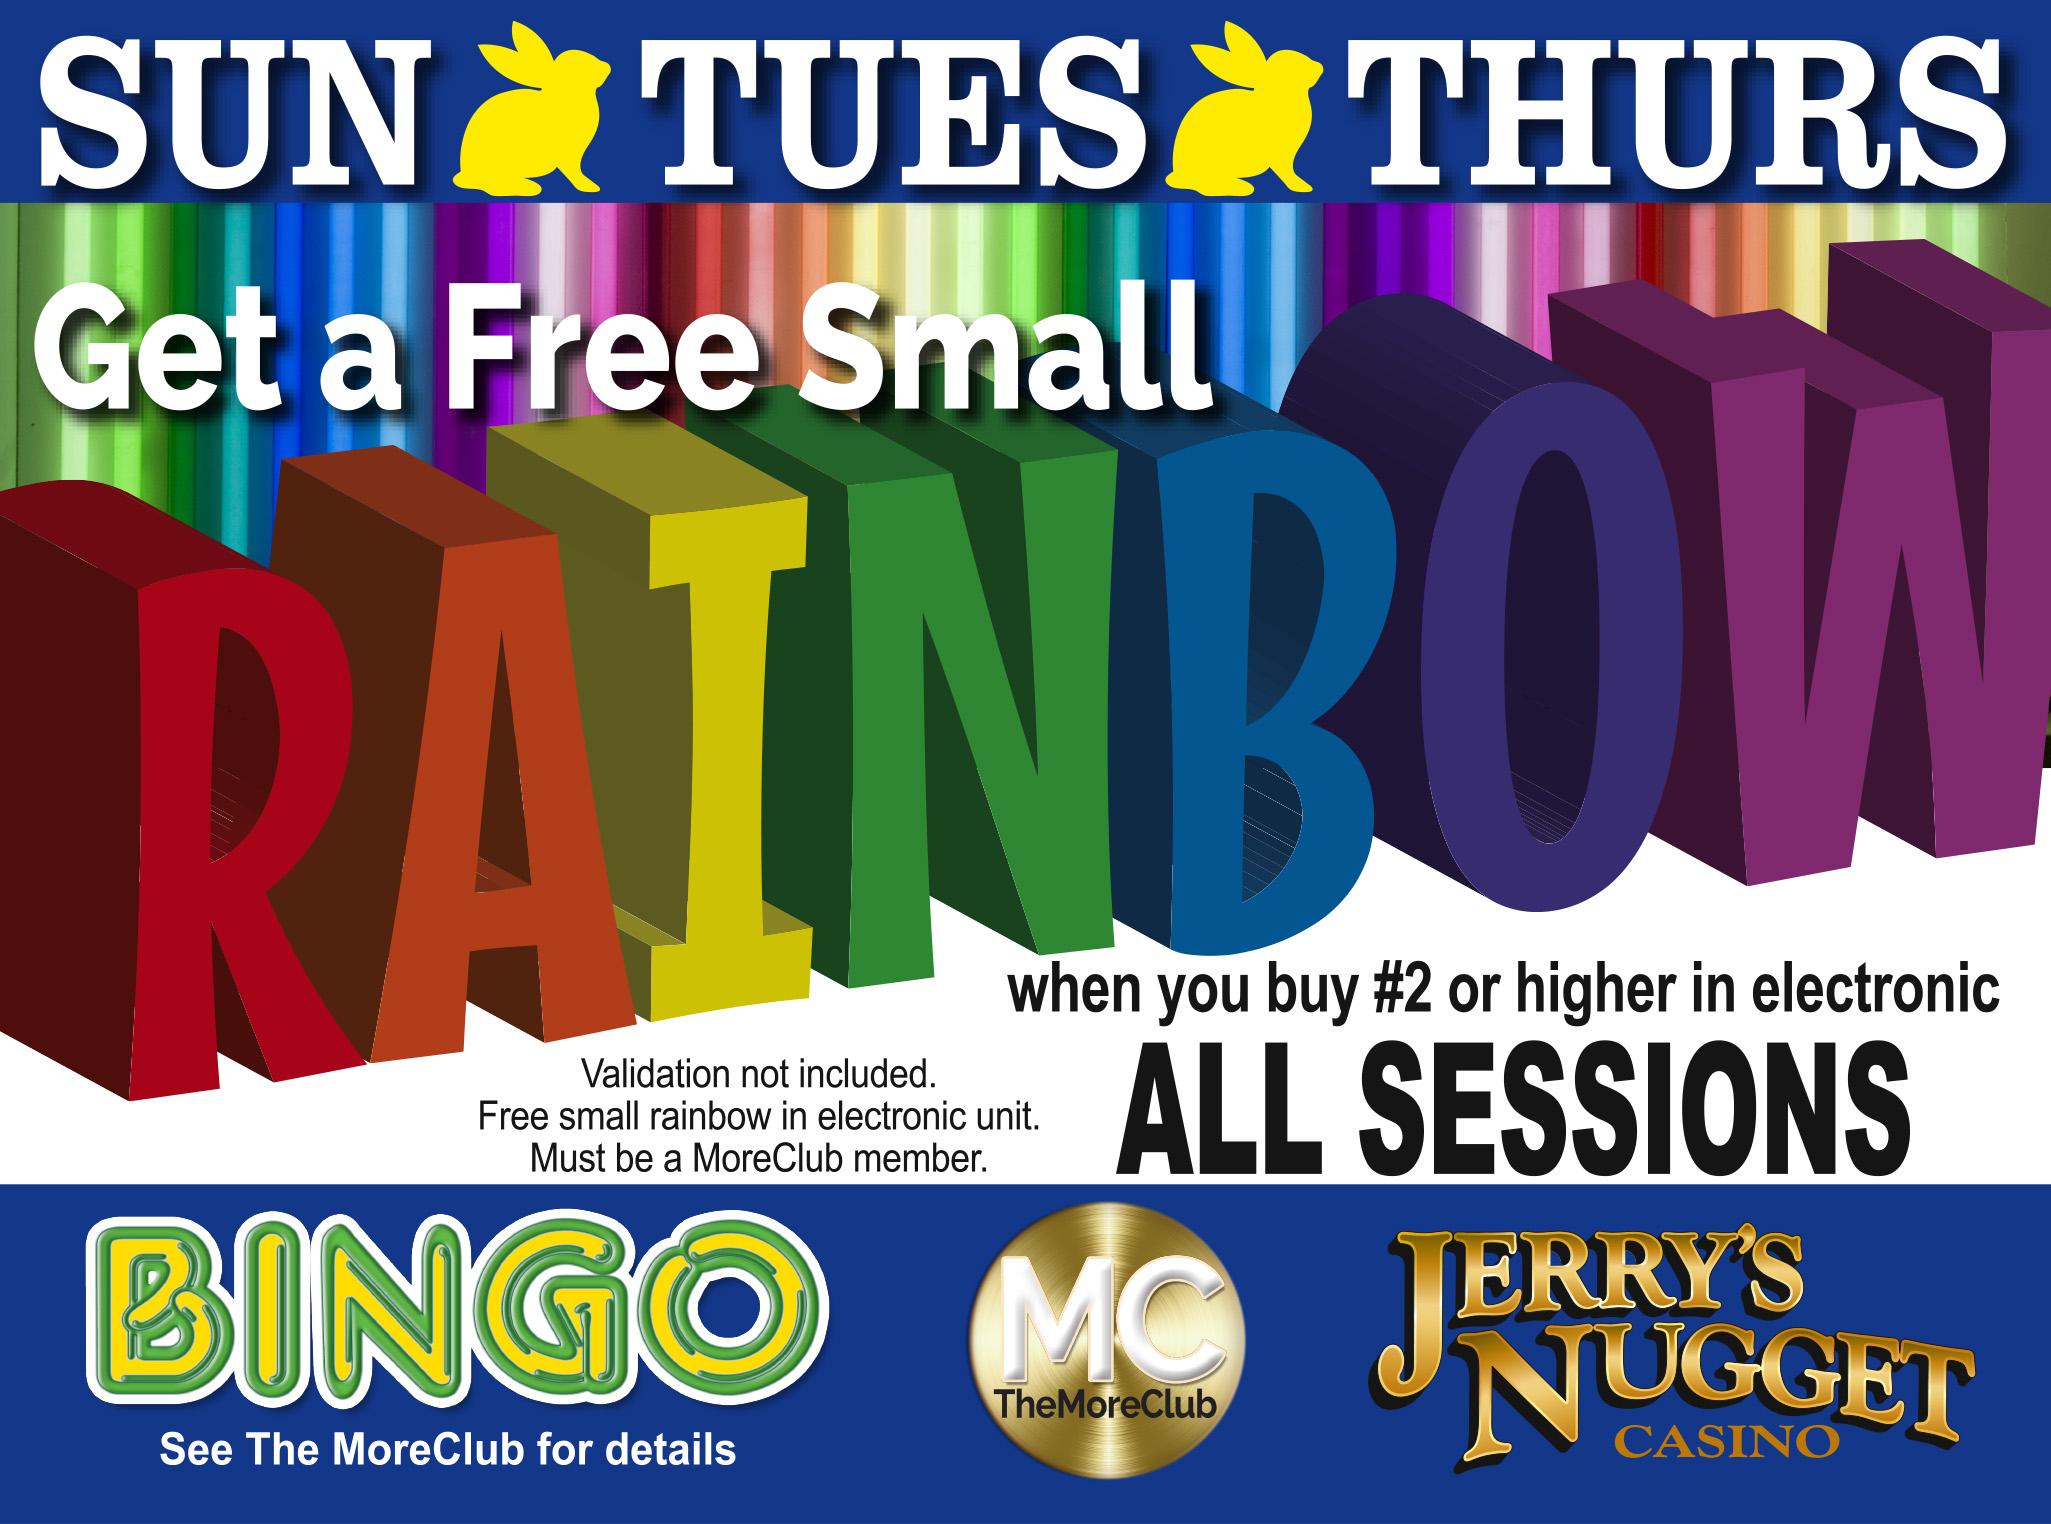 Bingo Free Small Rainbow